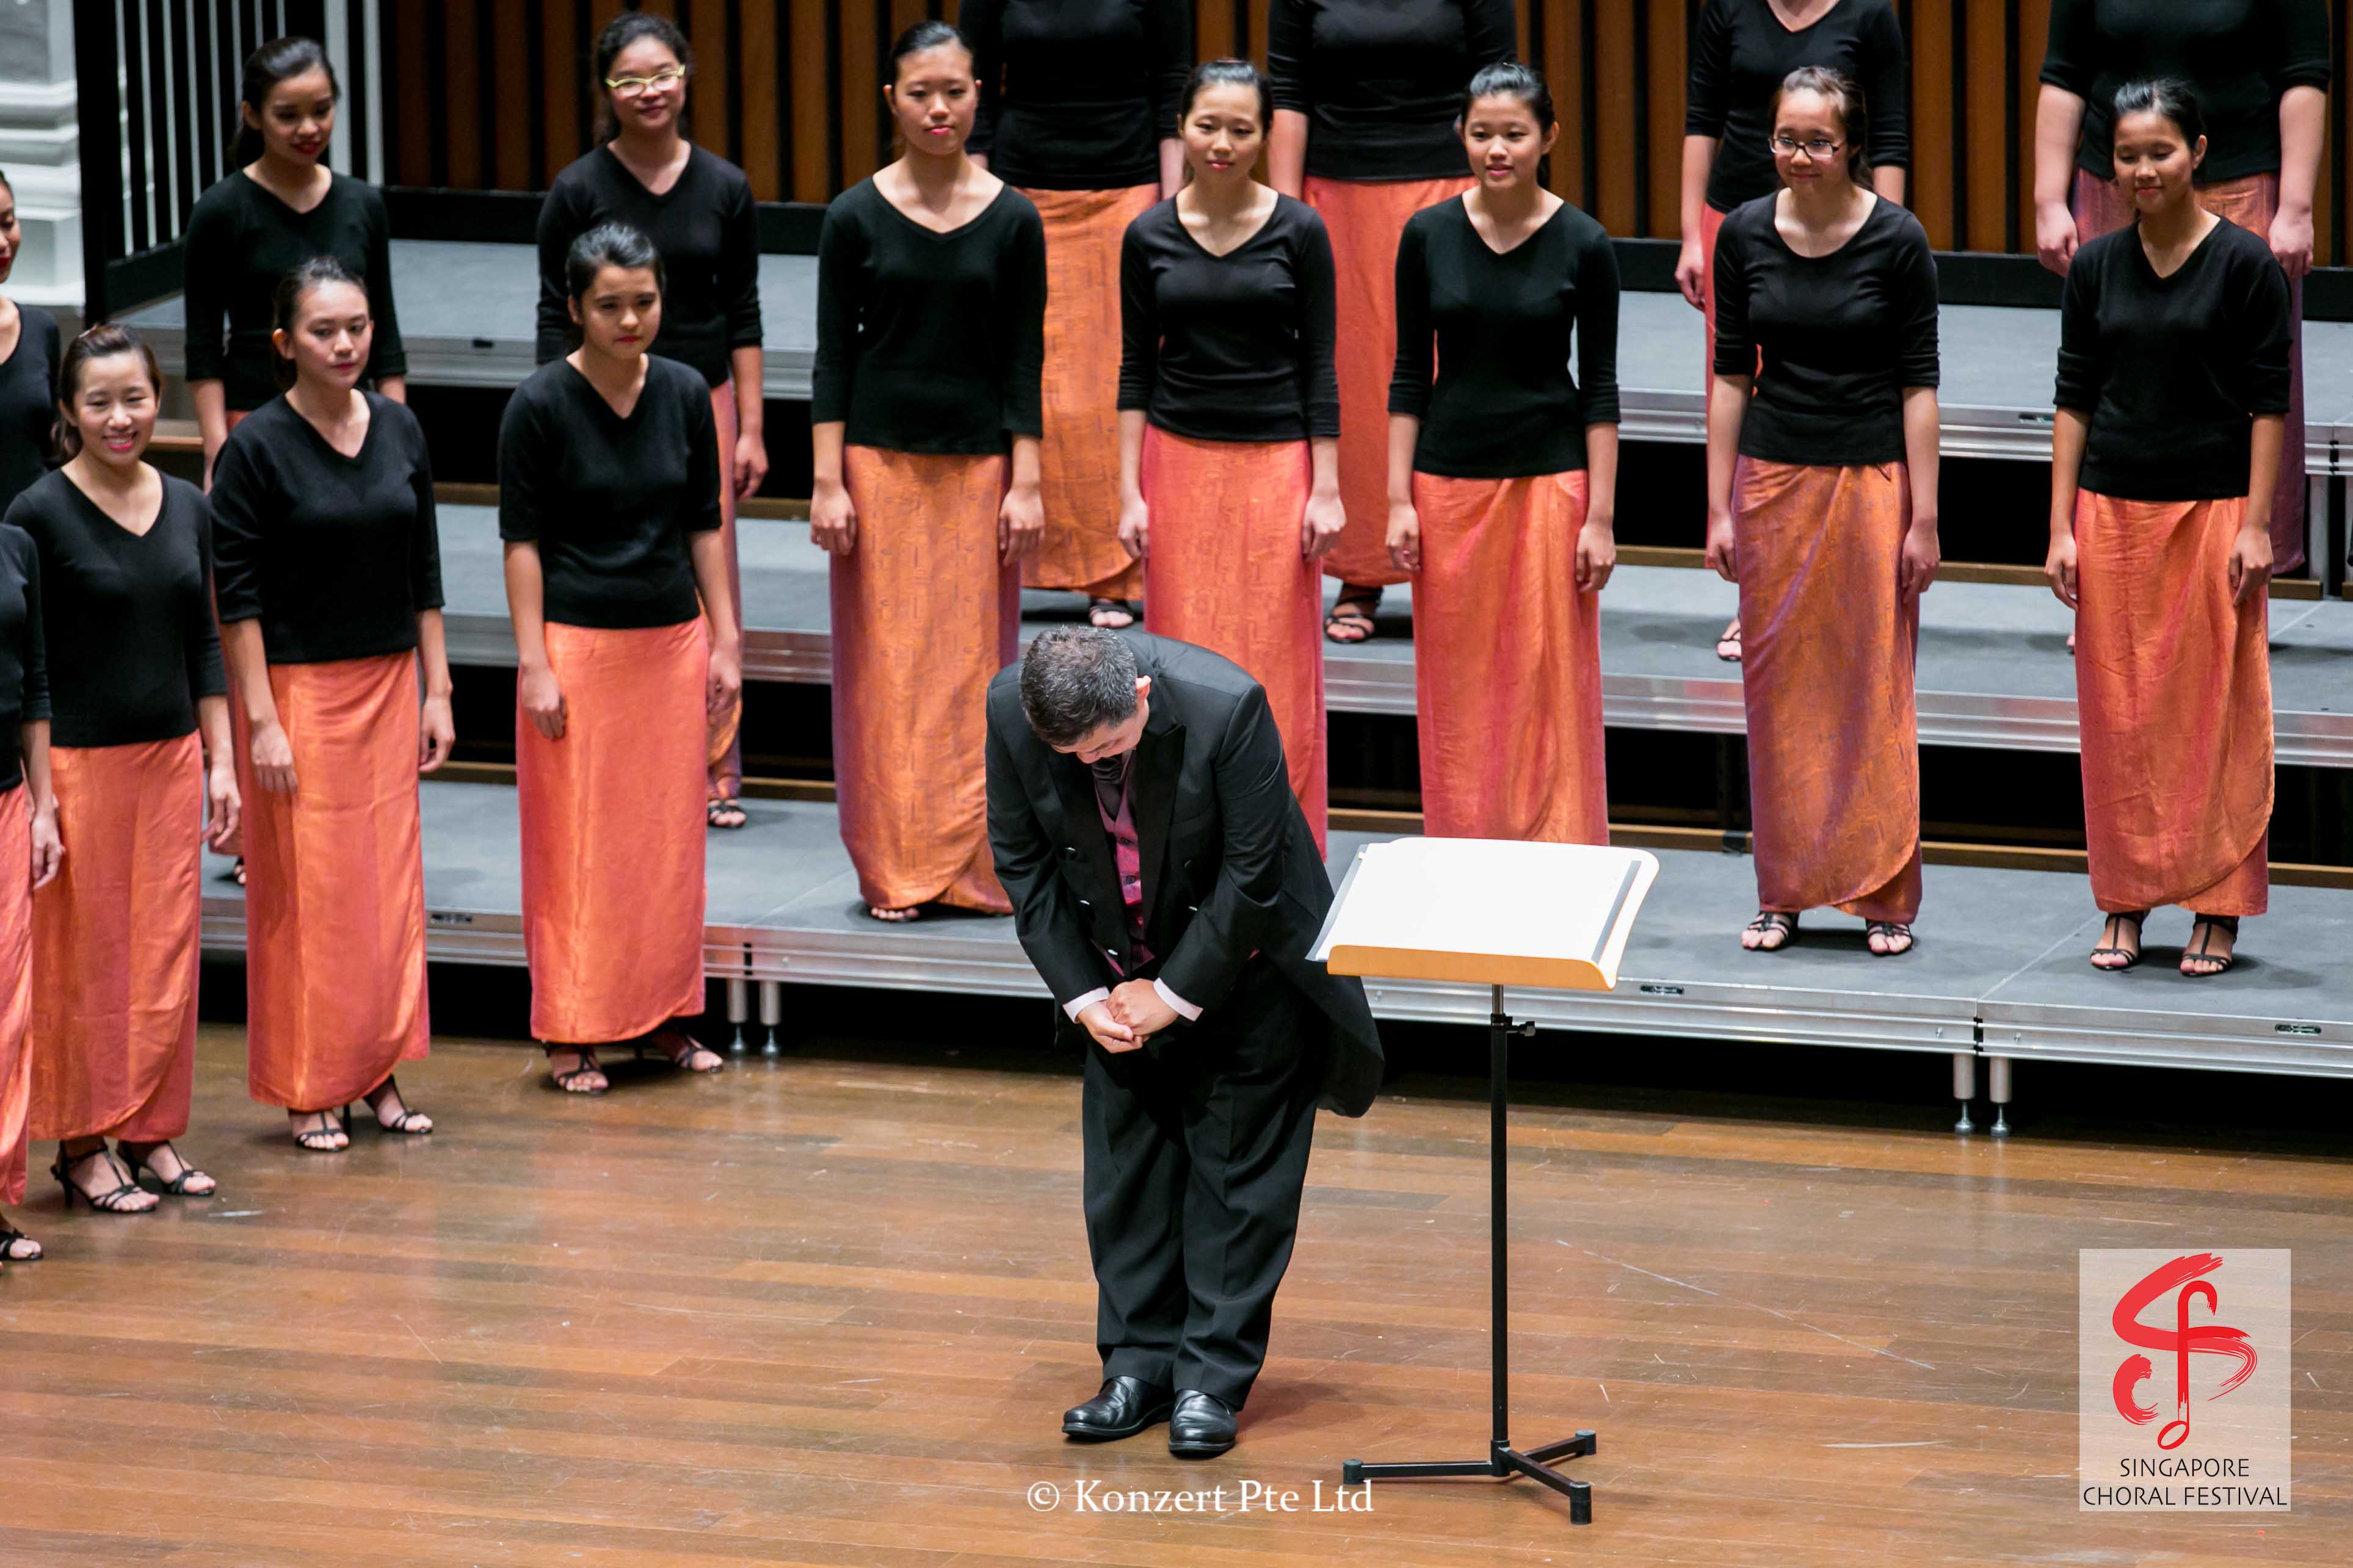 Singapore Choral Festival 7-8-15 (296).jpg